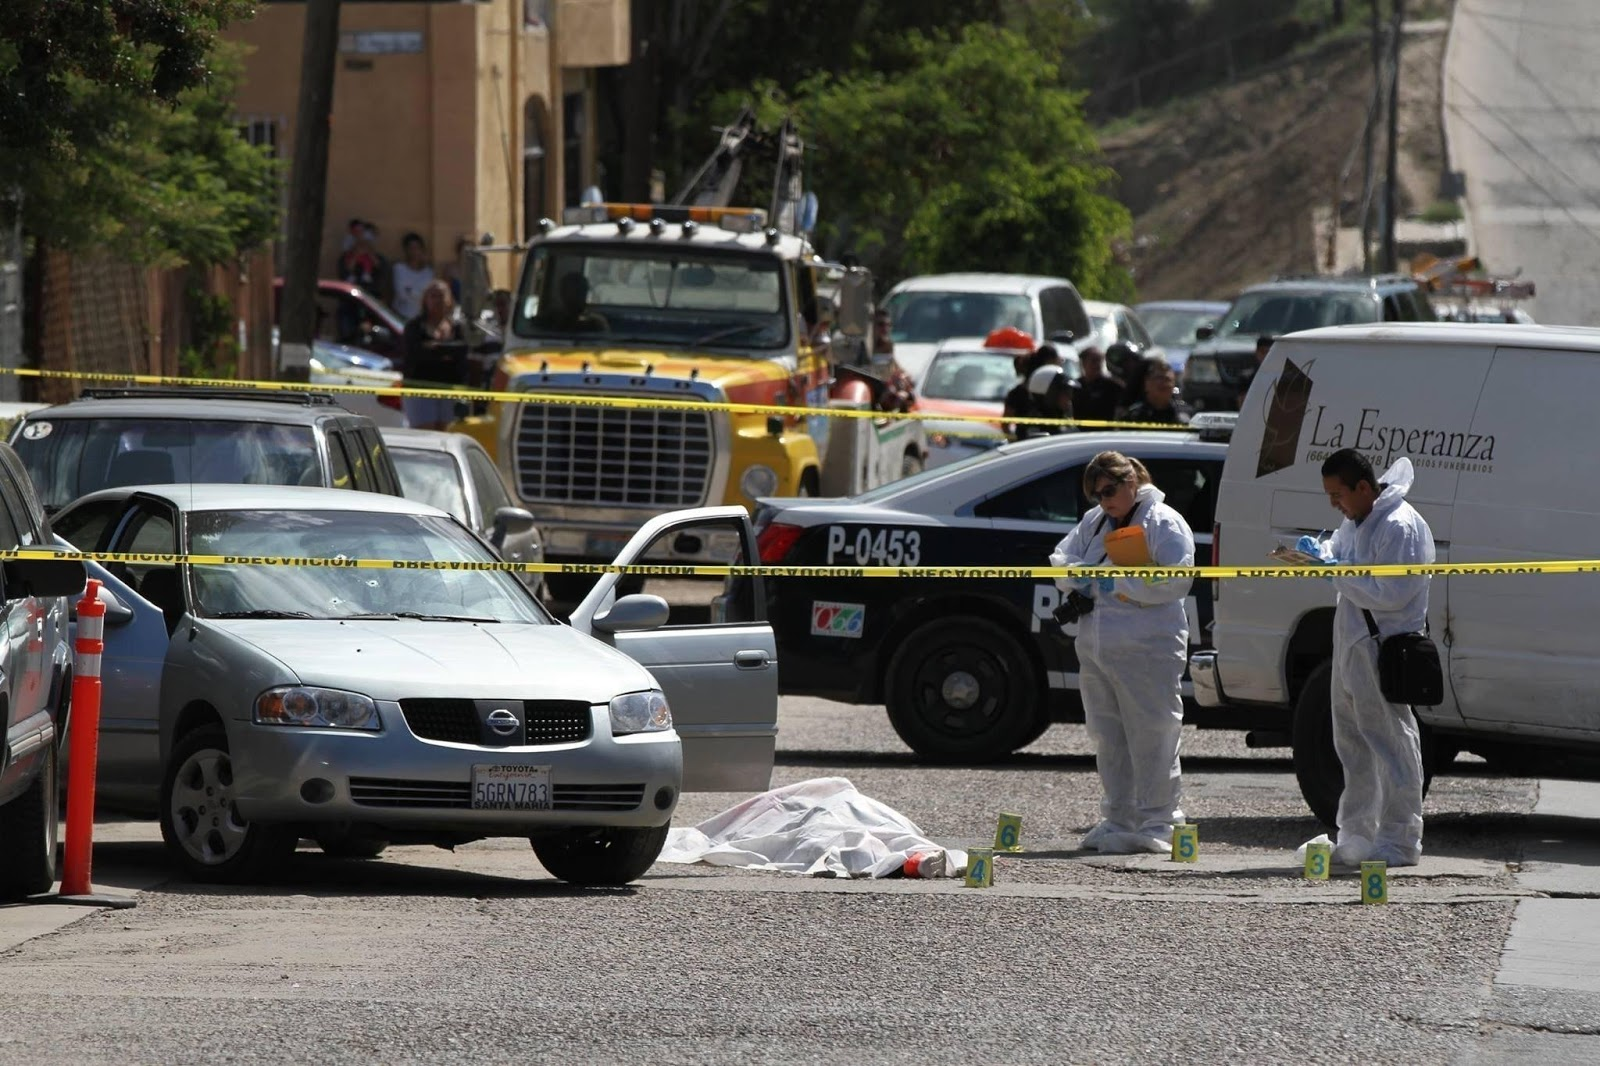 Lucha entre Cárteles deja 334 ejecutados en 3 meses  en Tijuana